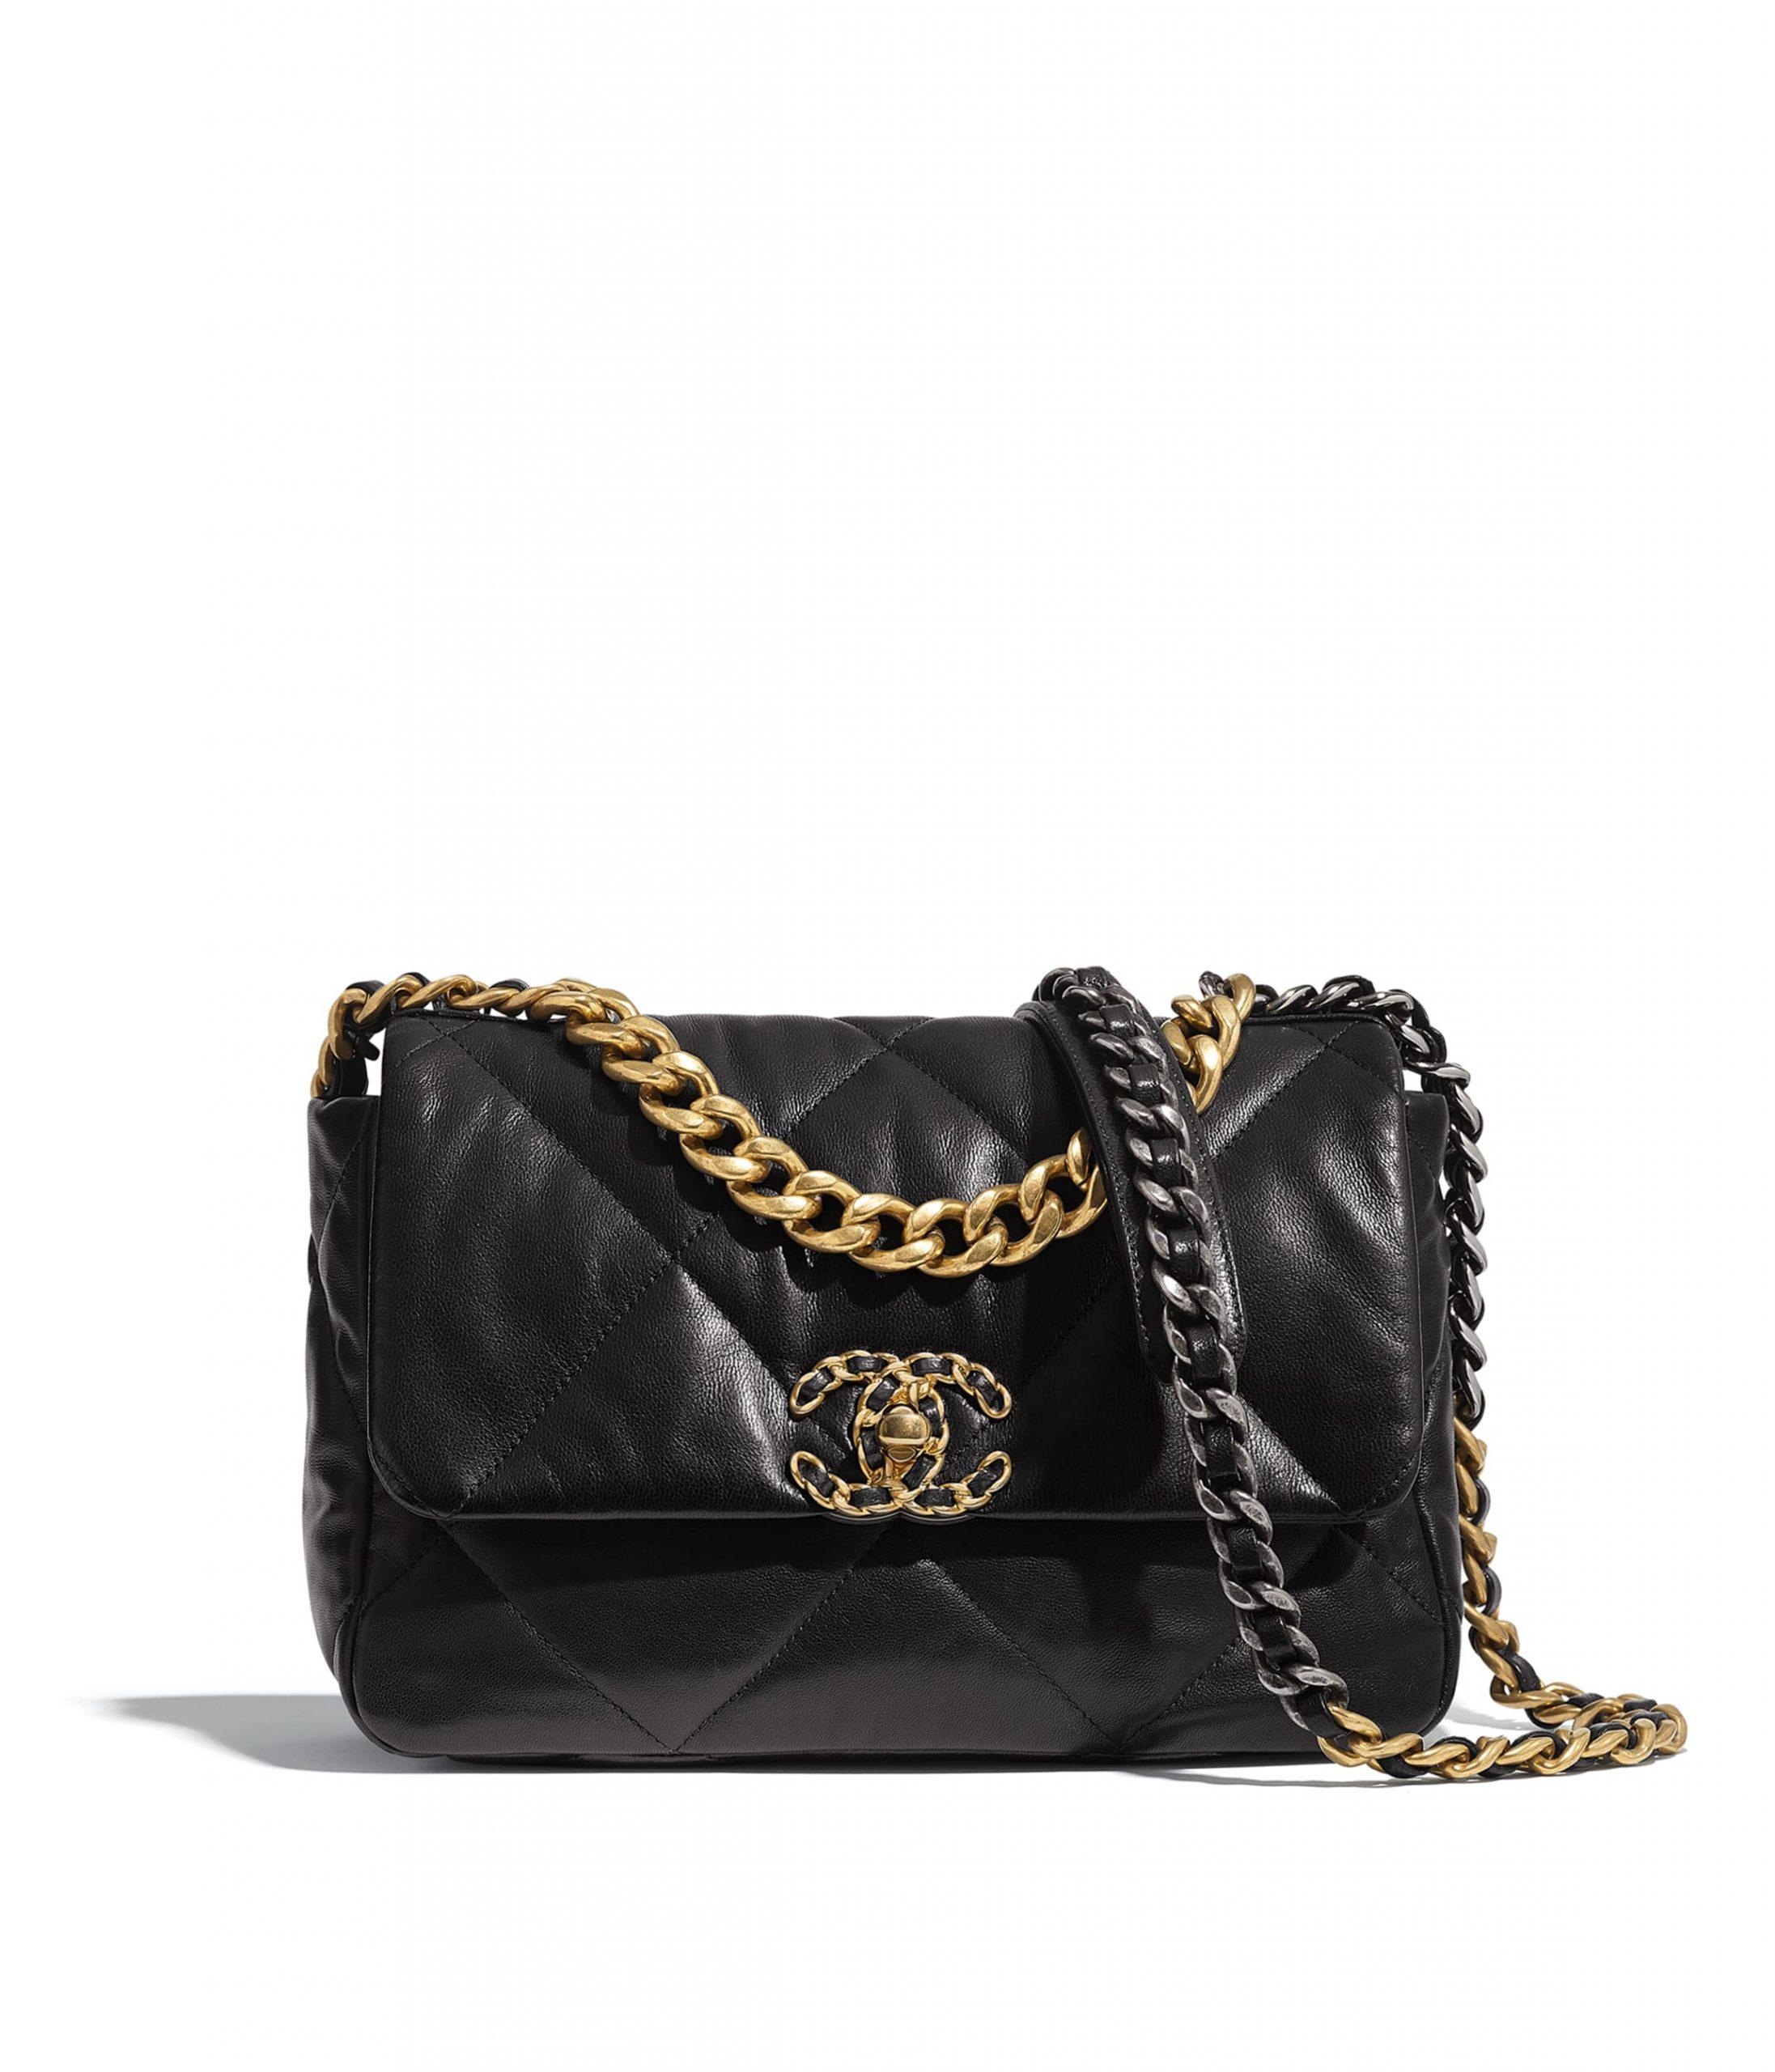 chanel 19 bag in black